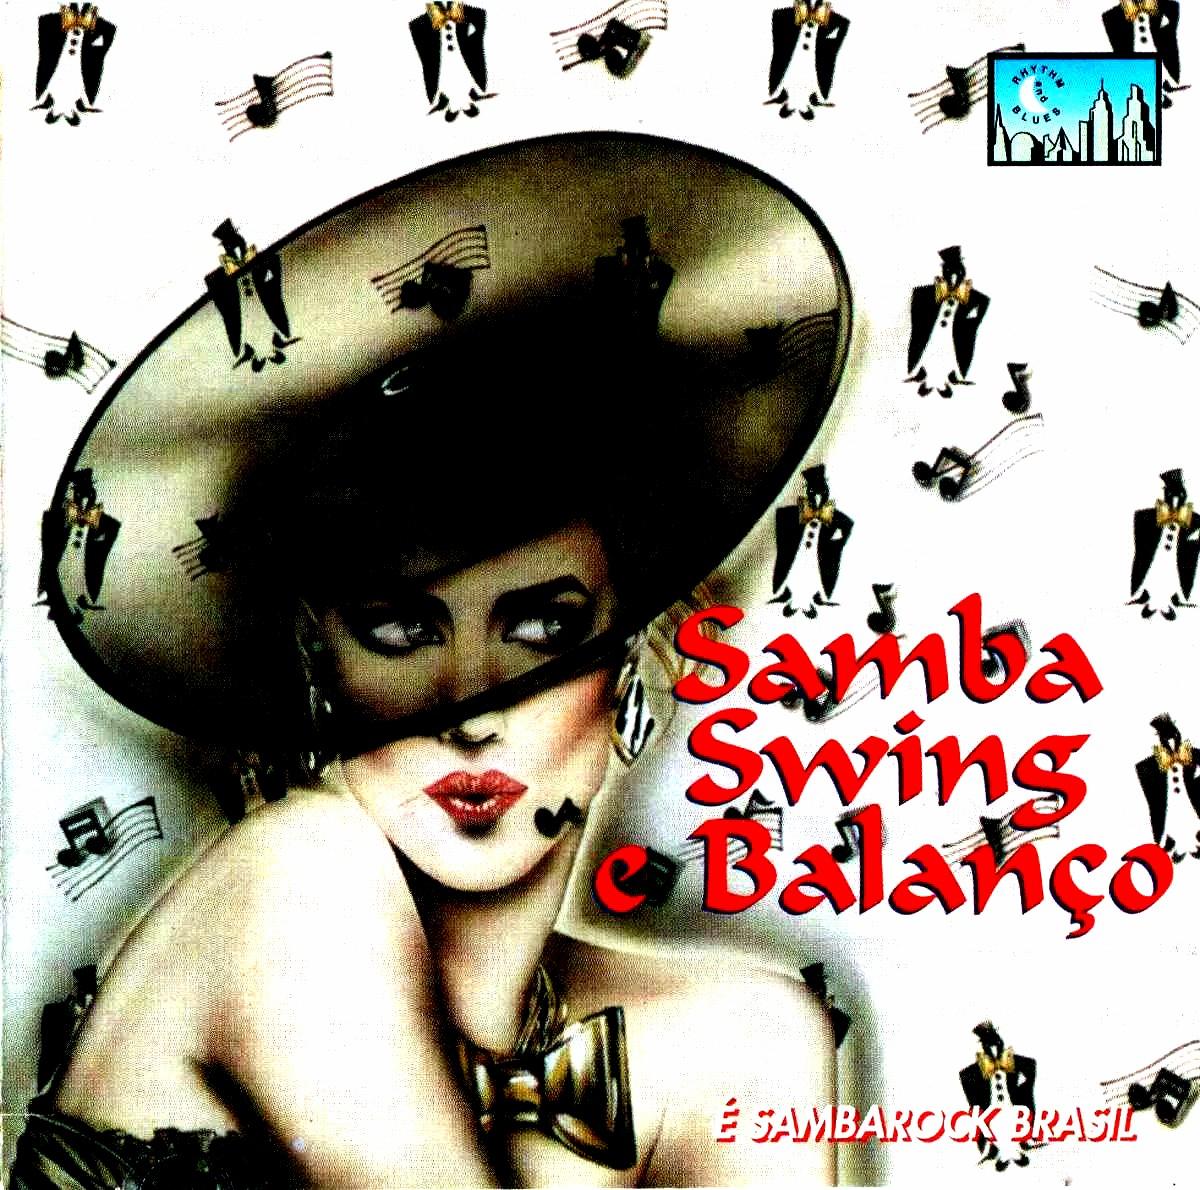 Samba, Swing E Balanço - É Sambarock Brasil